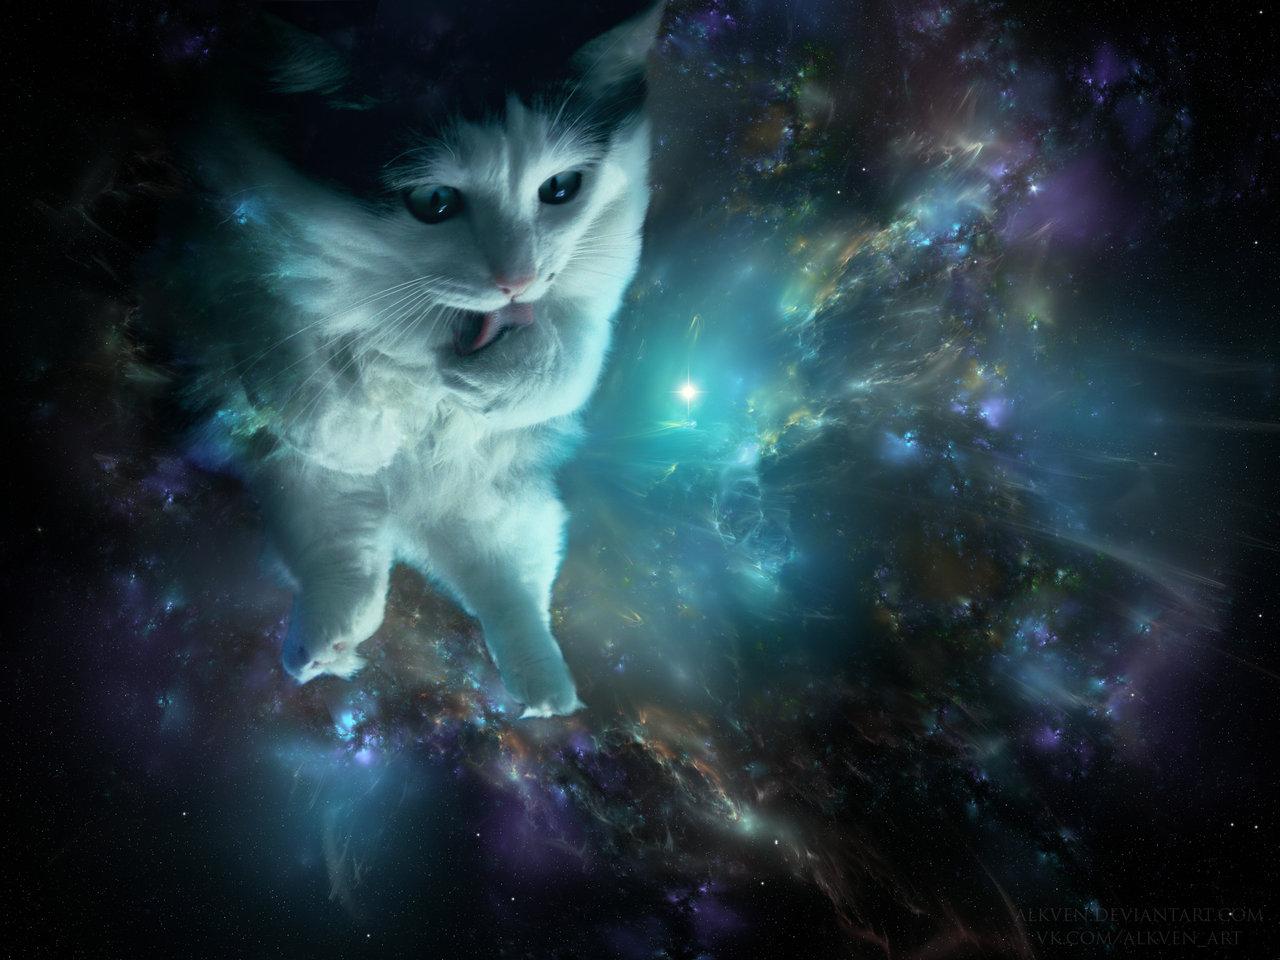 42 cat in space wallpaper on wallpapersafari - Space kitty wallpaper ...